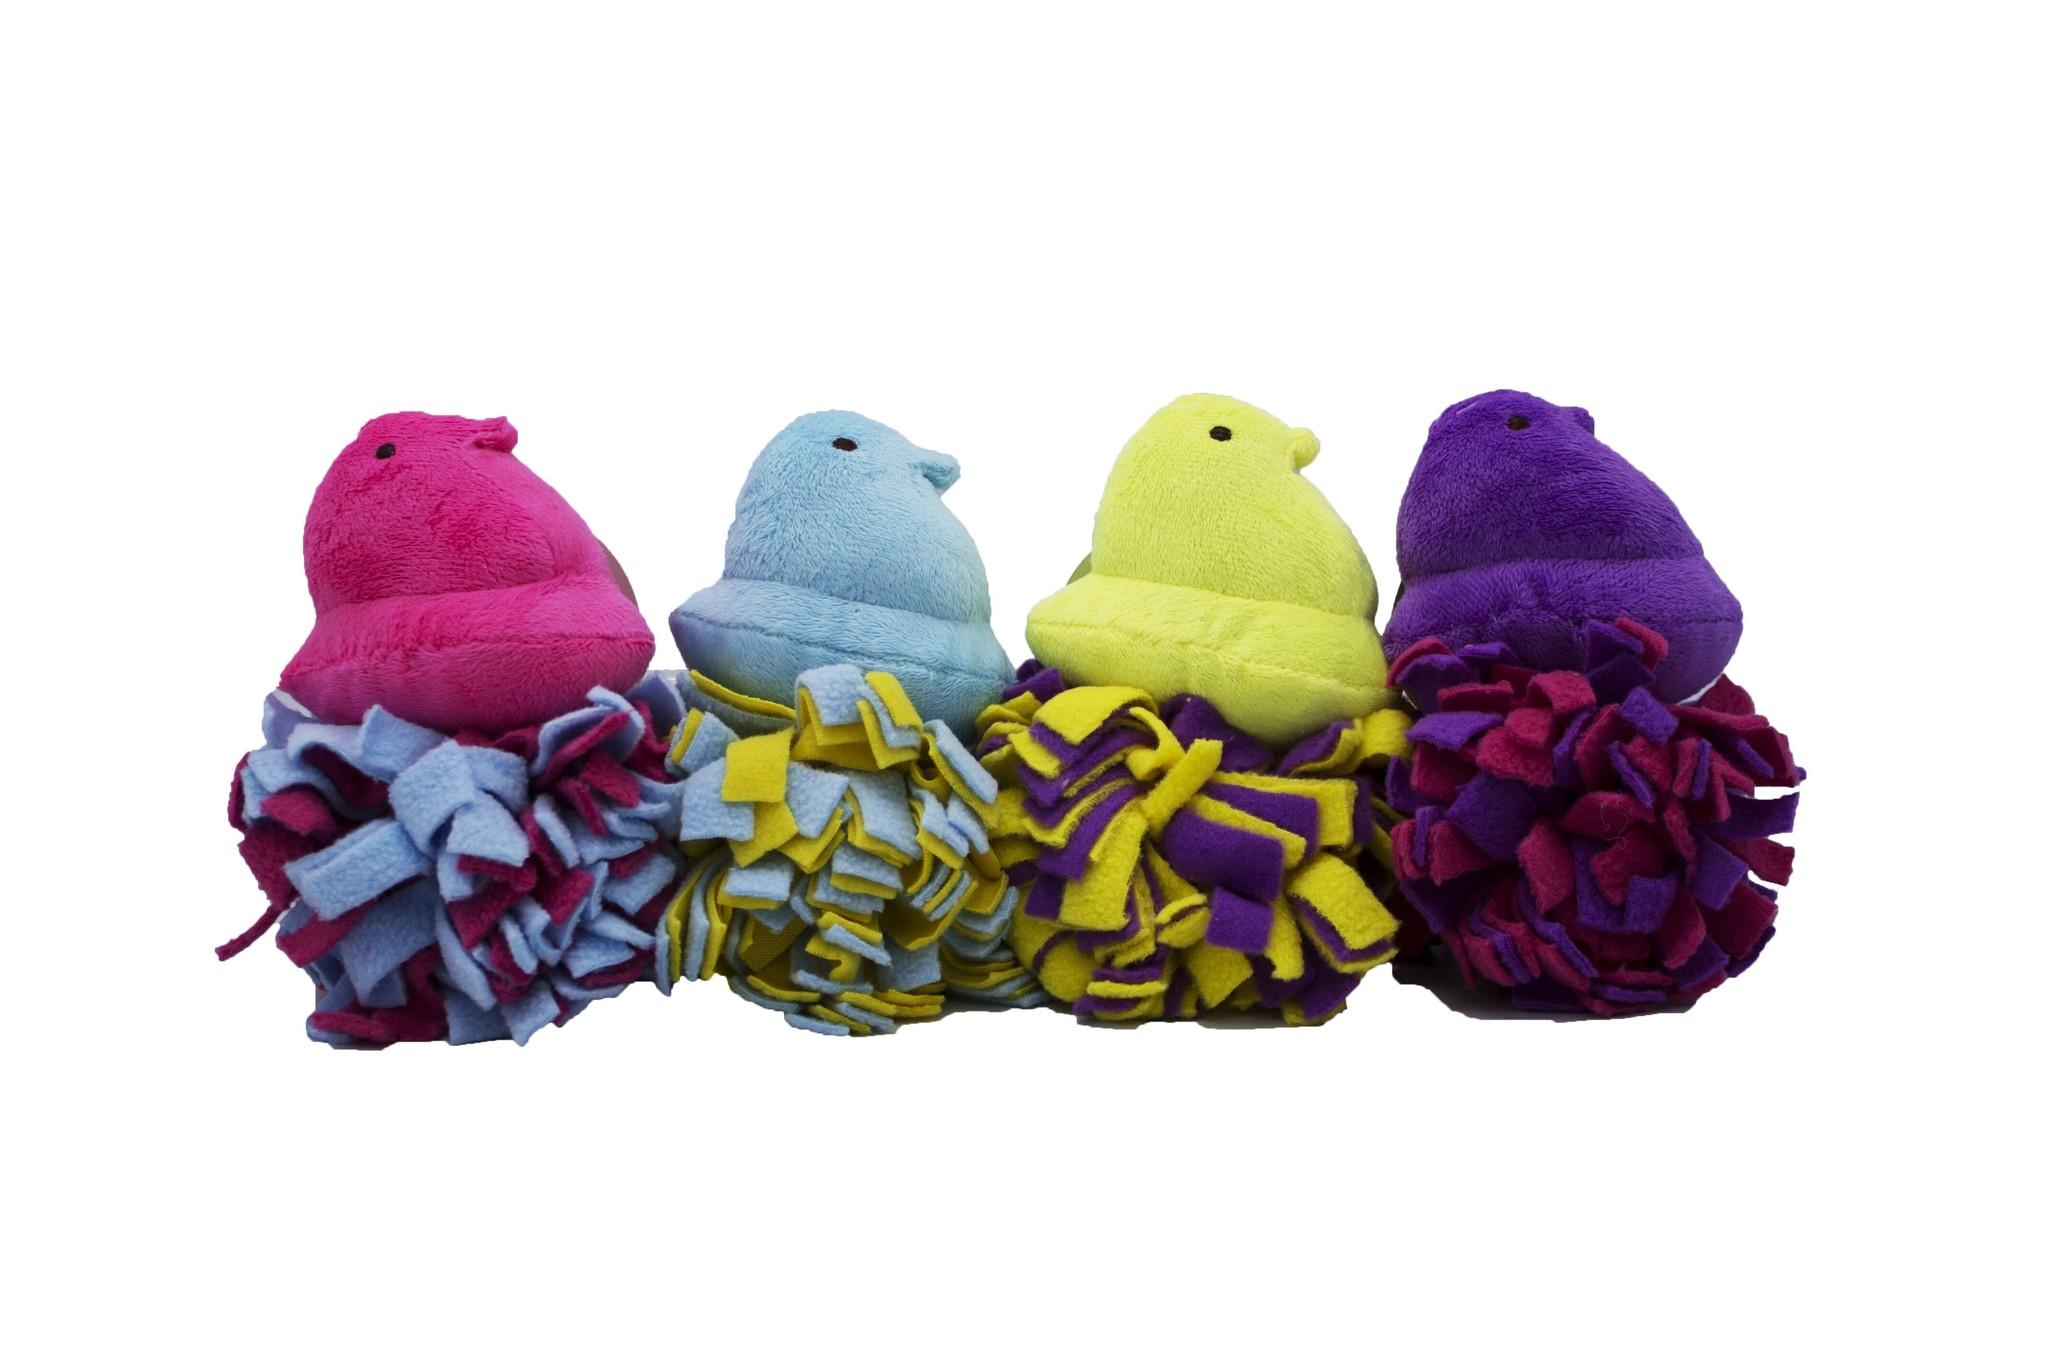 Fetch For Pets Fetch For Pets Peeps Chick Toy Fleece Bottom Plush Asst Colors